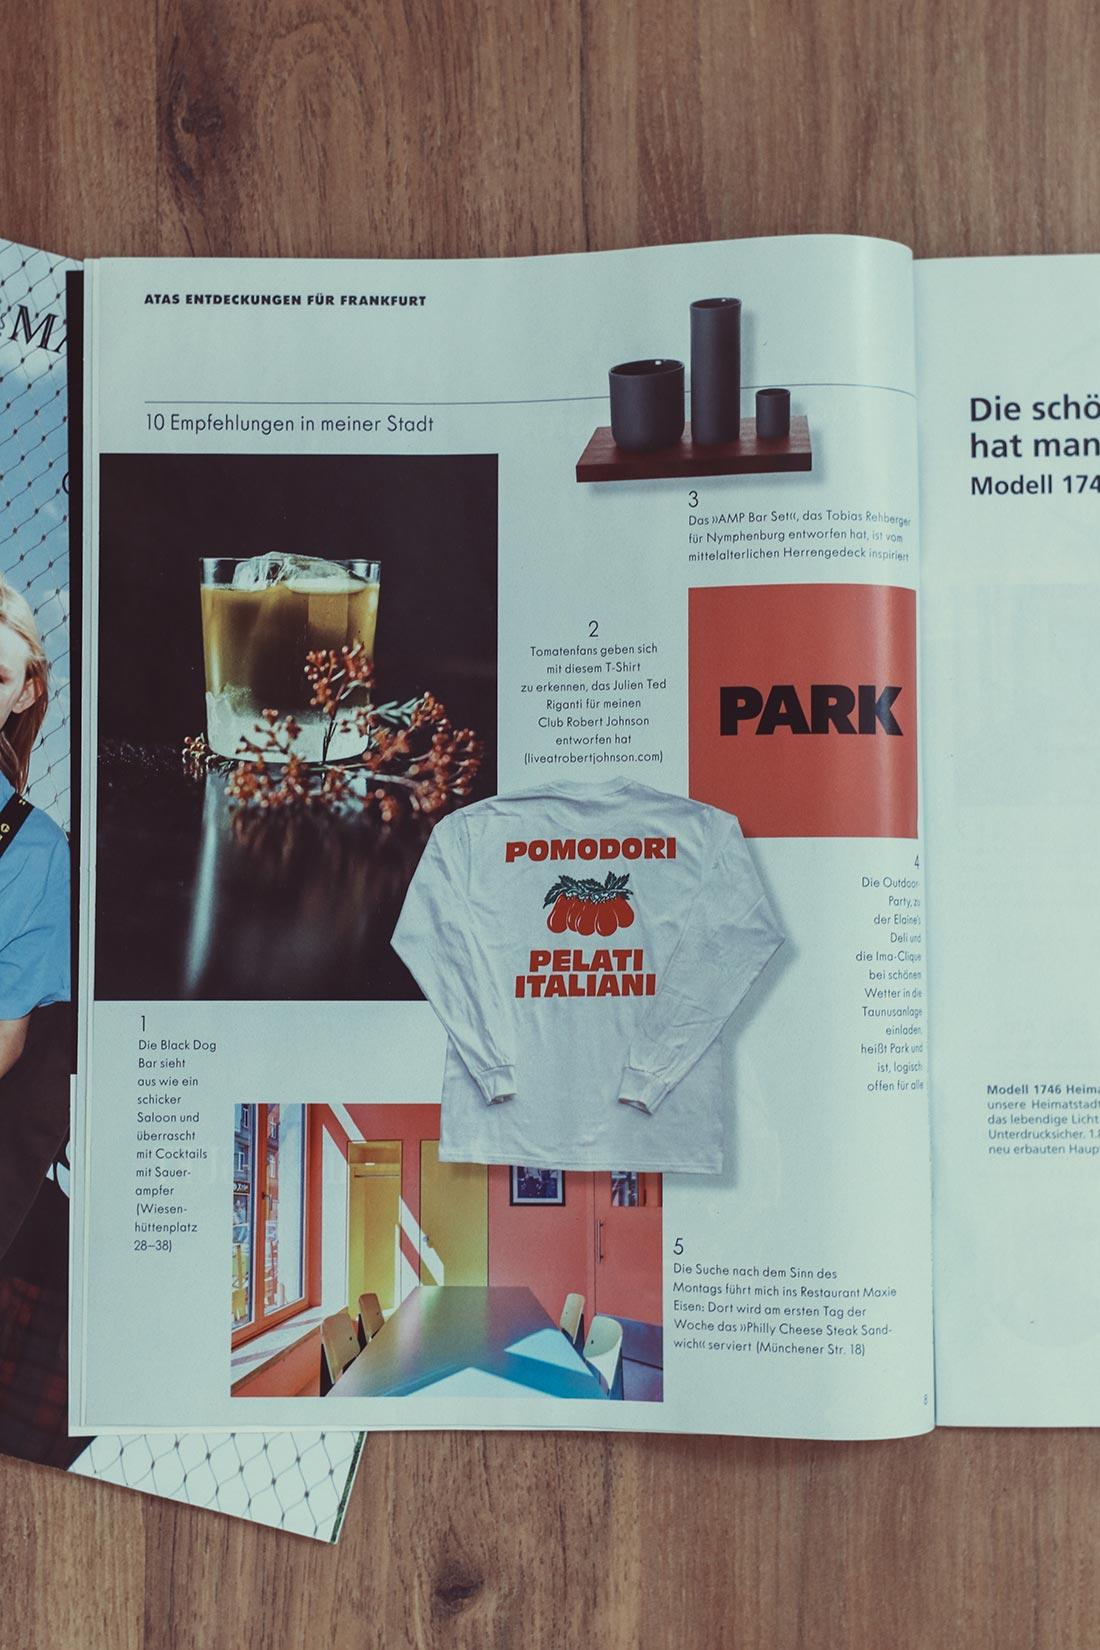 ZEITmagazin Lokalausgabe Frankfurt